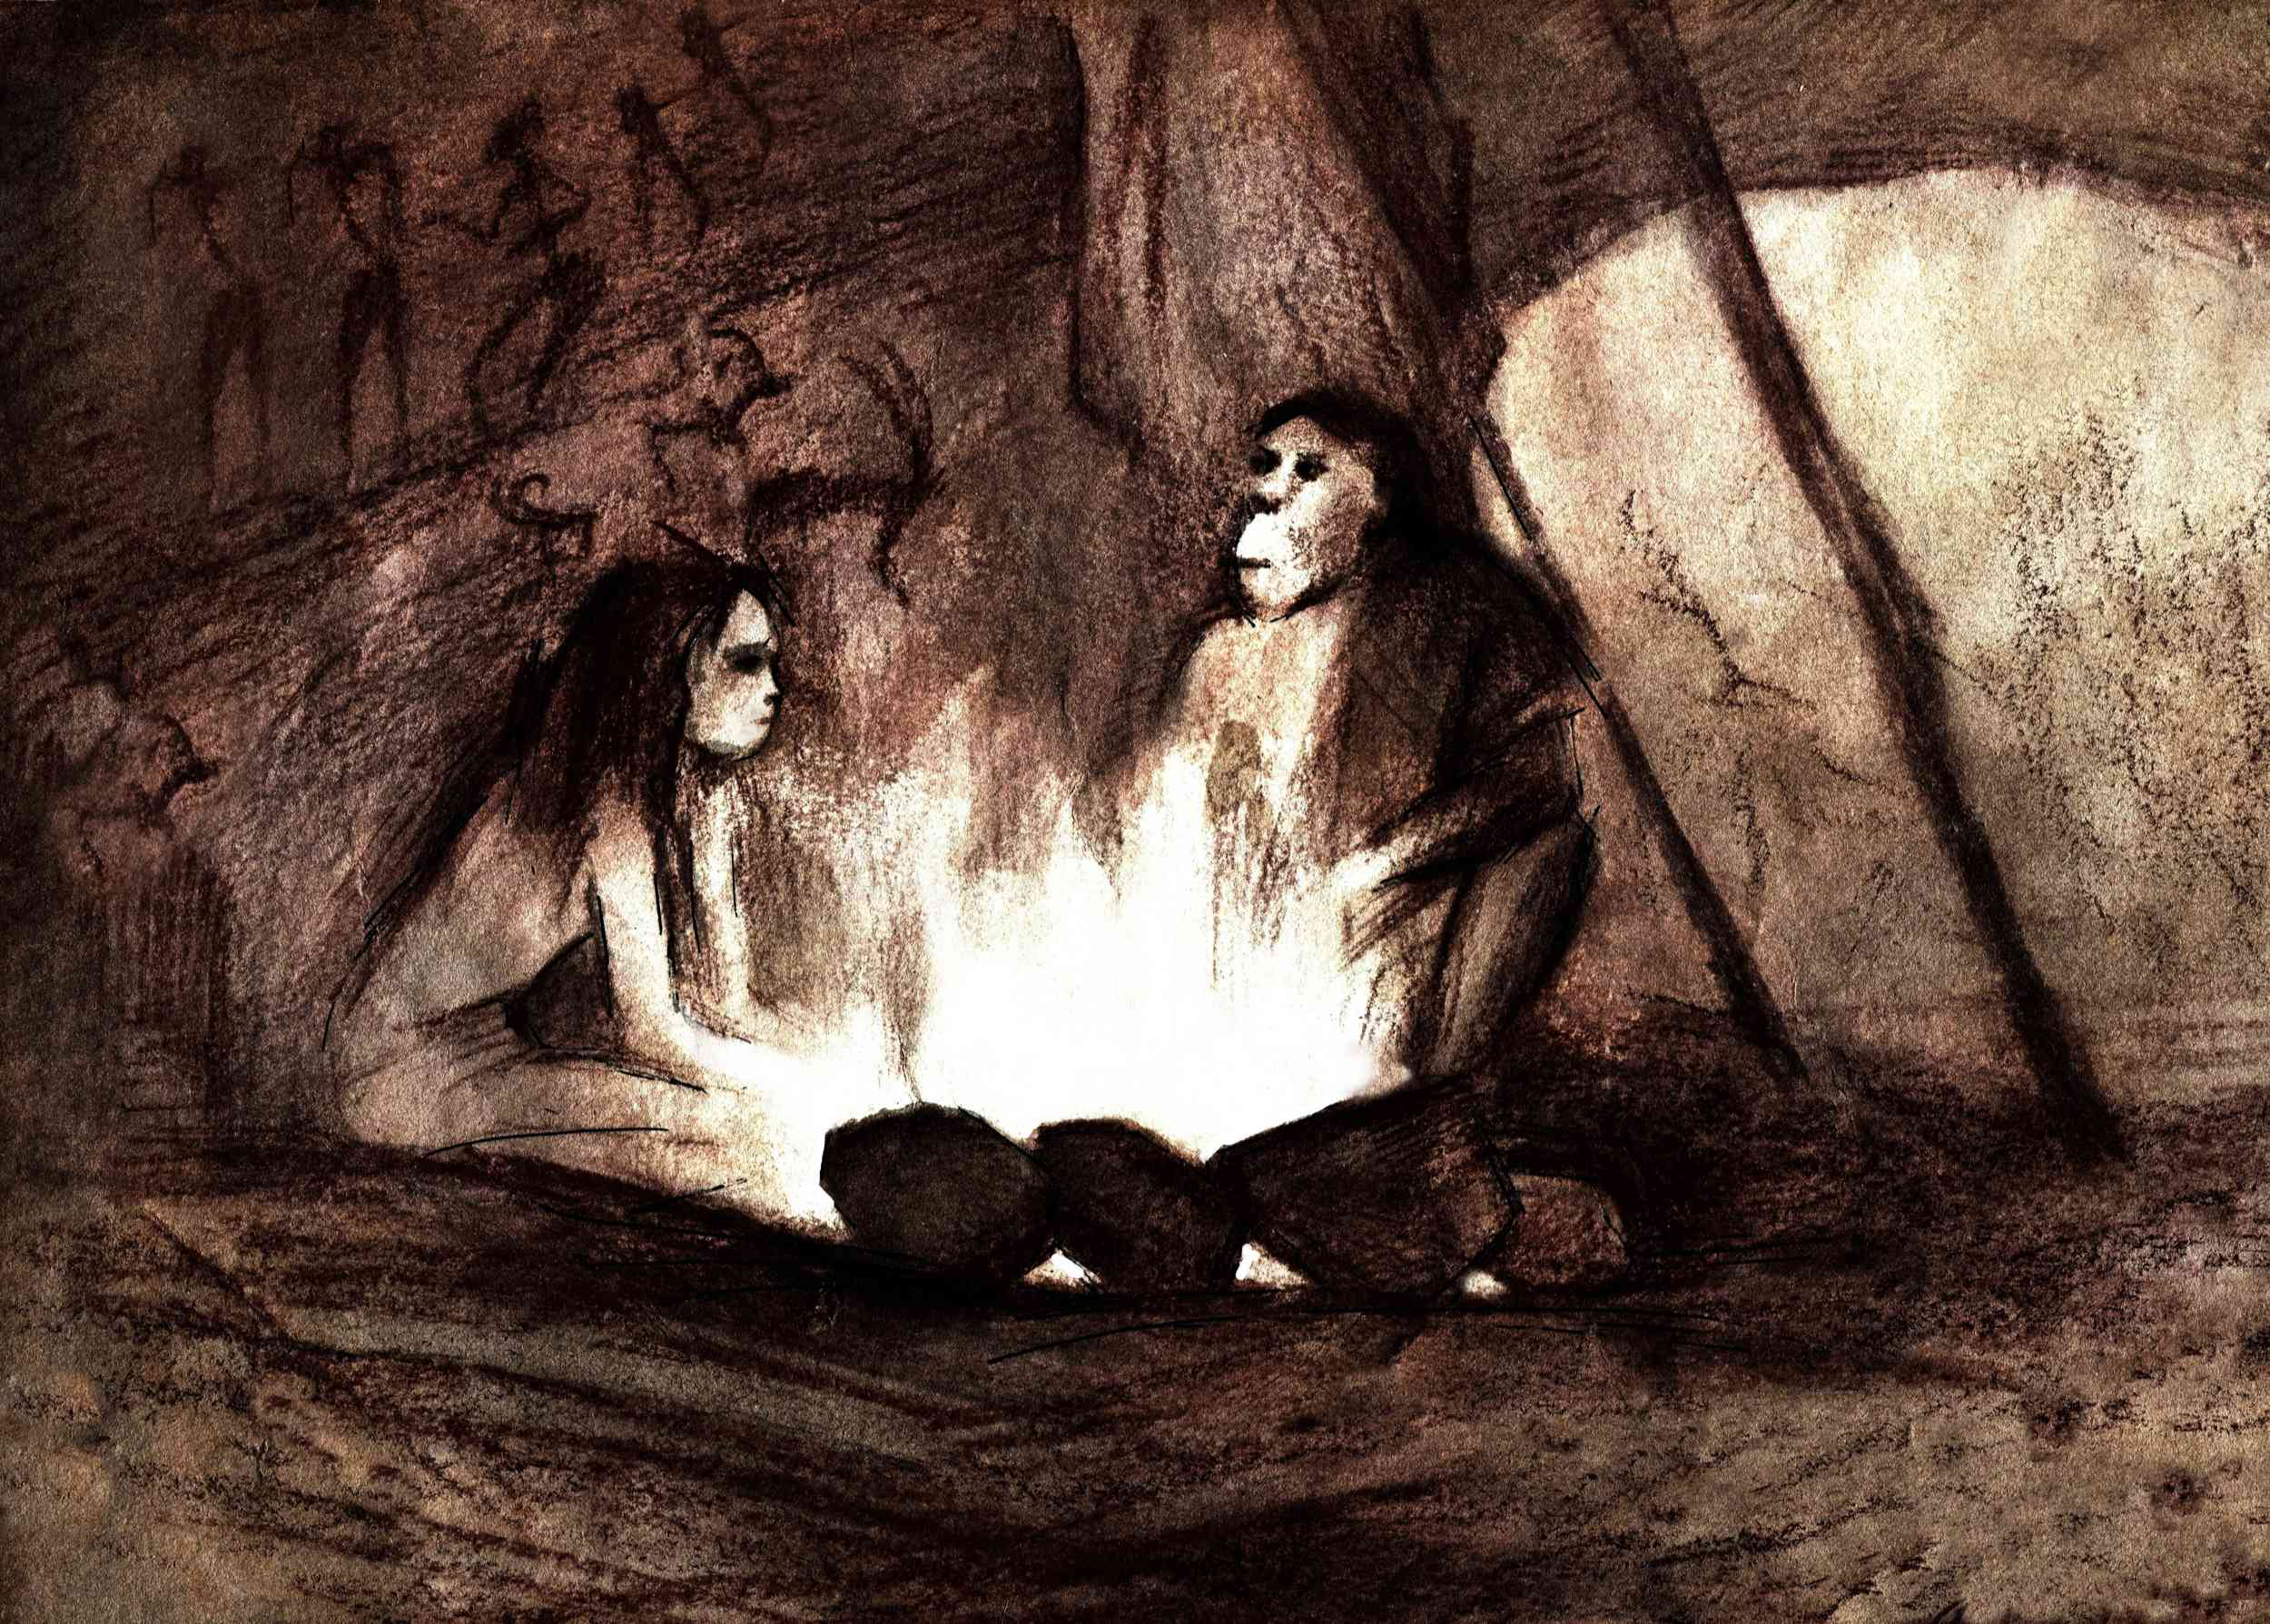 neanderthal, homo sapien, Denisovan